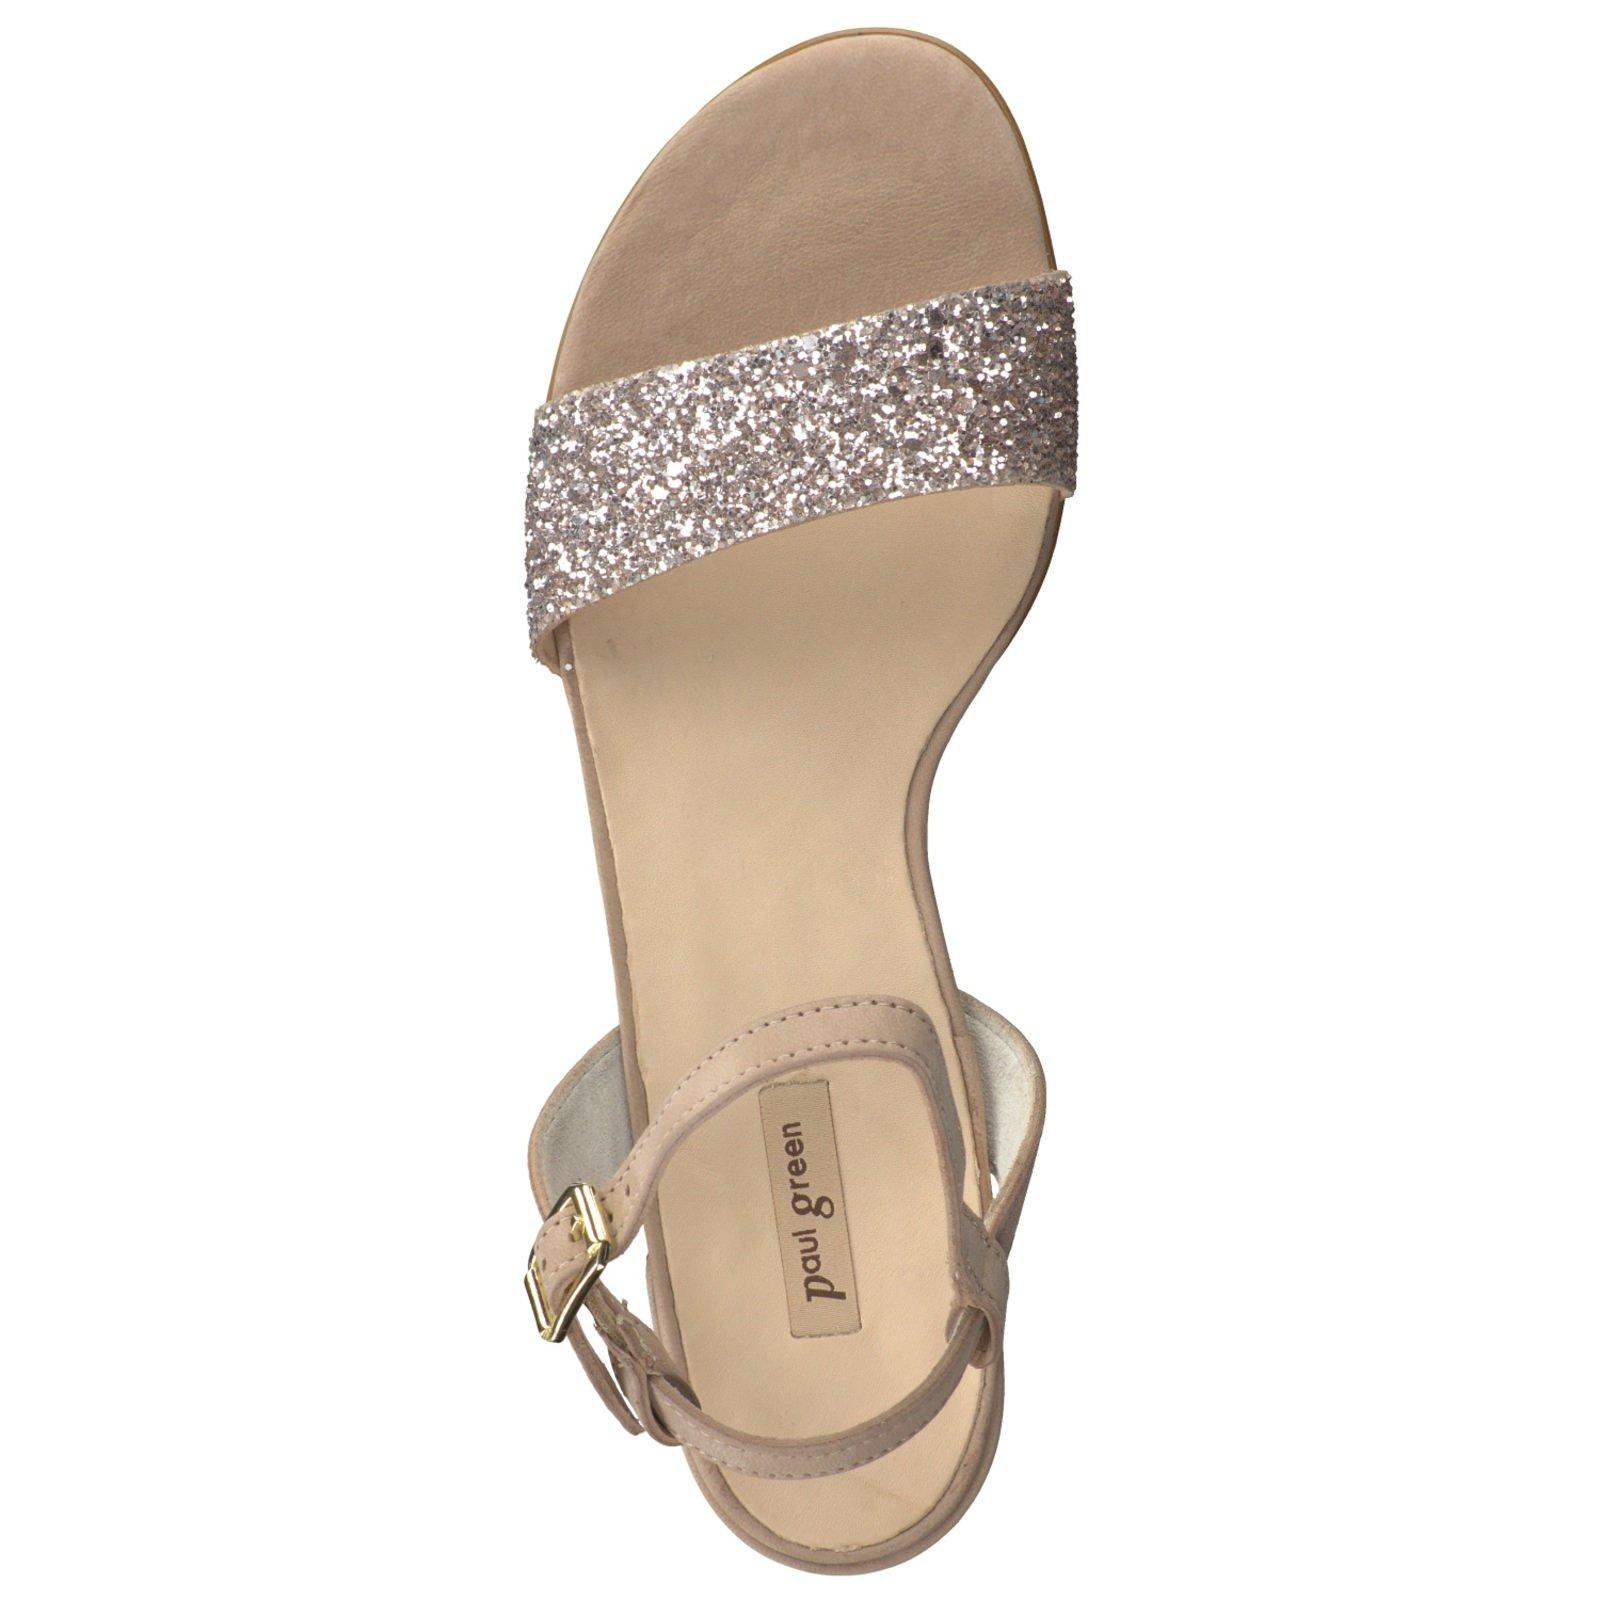 Paul Green Damen Sandalette in beige kaufen   Zumnorde Online-Shop 47e985bc20